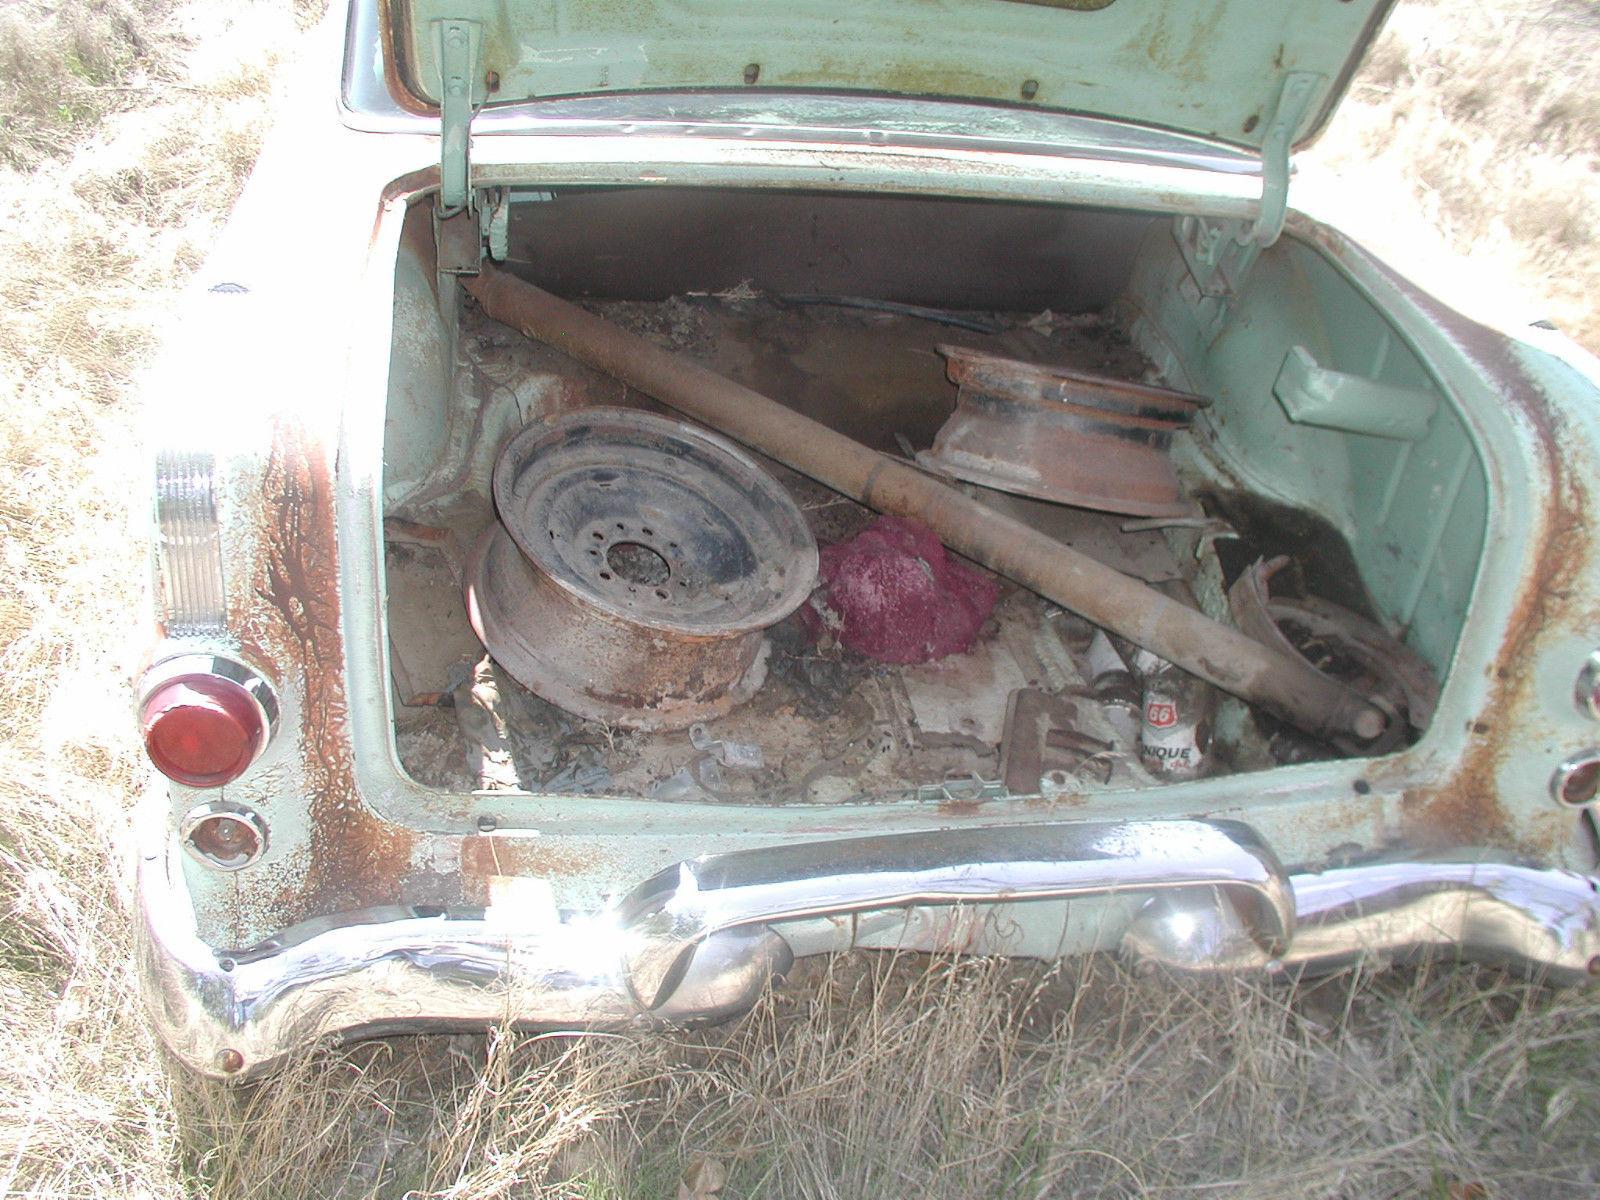 1956 Pontiac 2 Door Post Classic Rat Rod 55 Chevy Parts